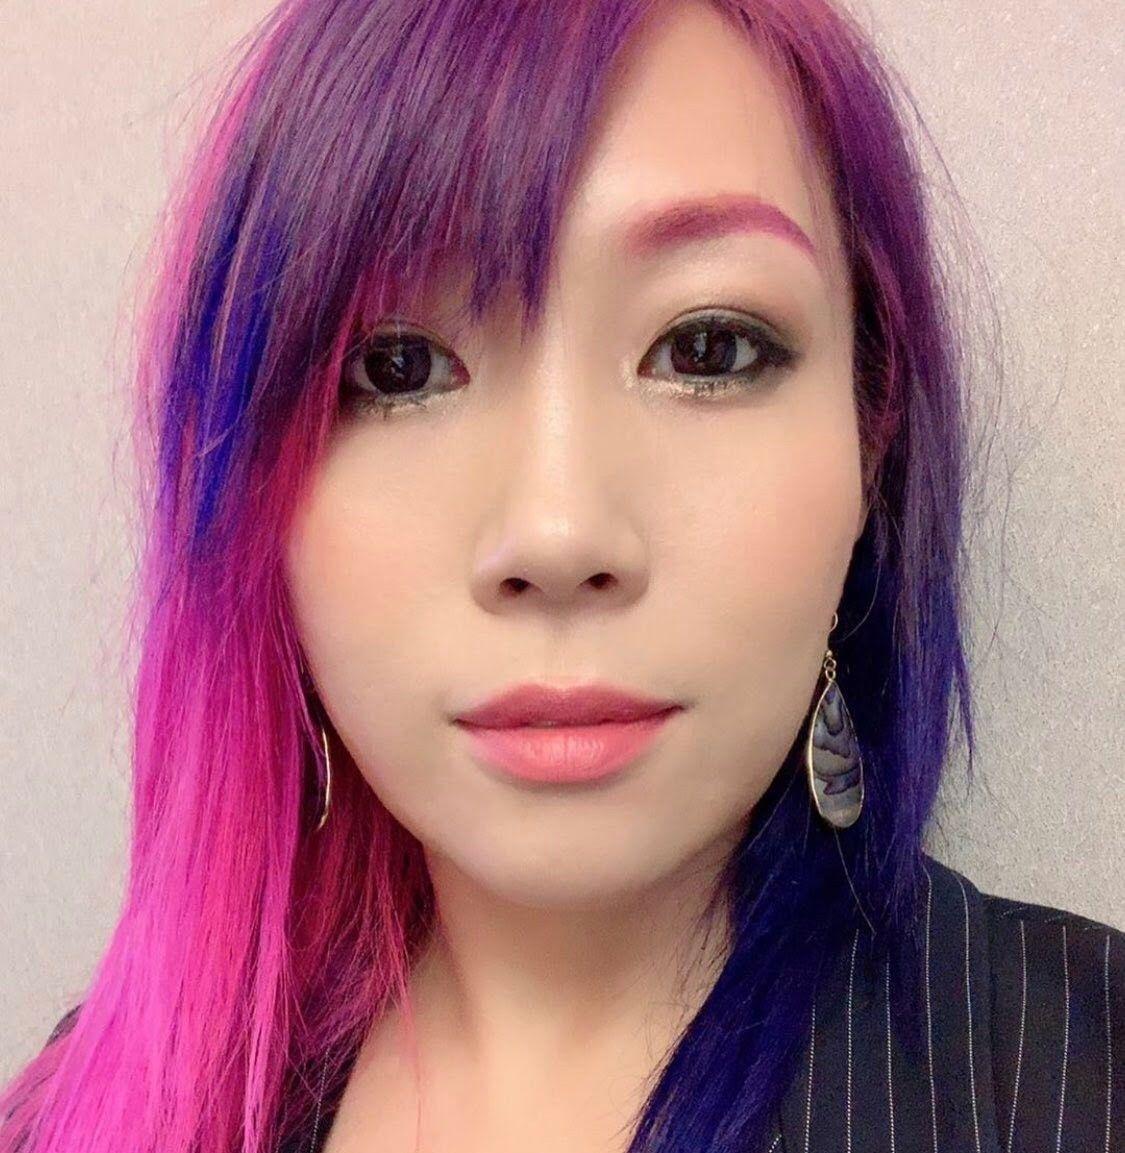 Kanako Urai | Wwe, Wwe womens, Professional wrestling